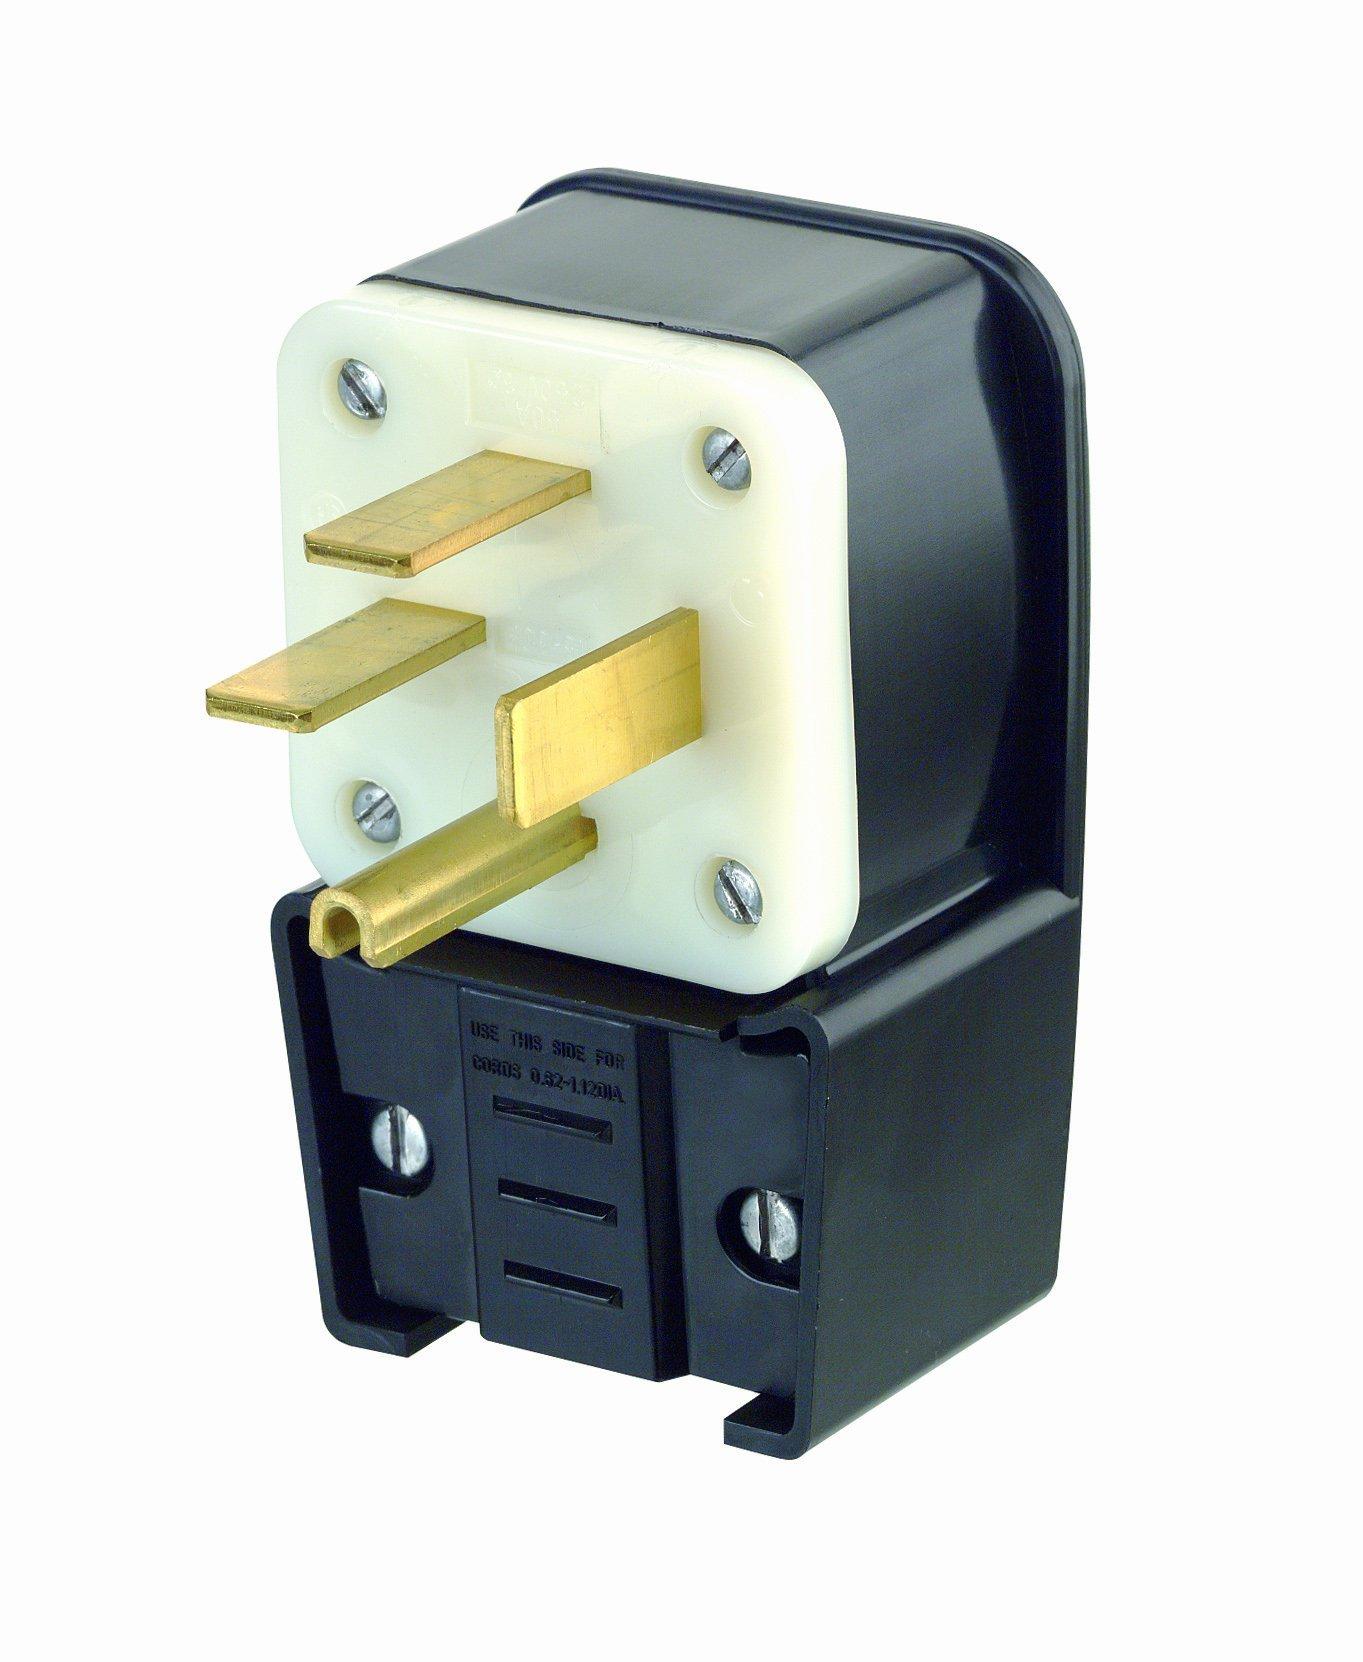 Leviton 8452-P 50 Amp, 250 Volt- 3PY, Straight Blade, Plug, Industrial Grade, Grounding, Angle, Black